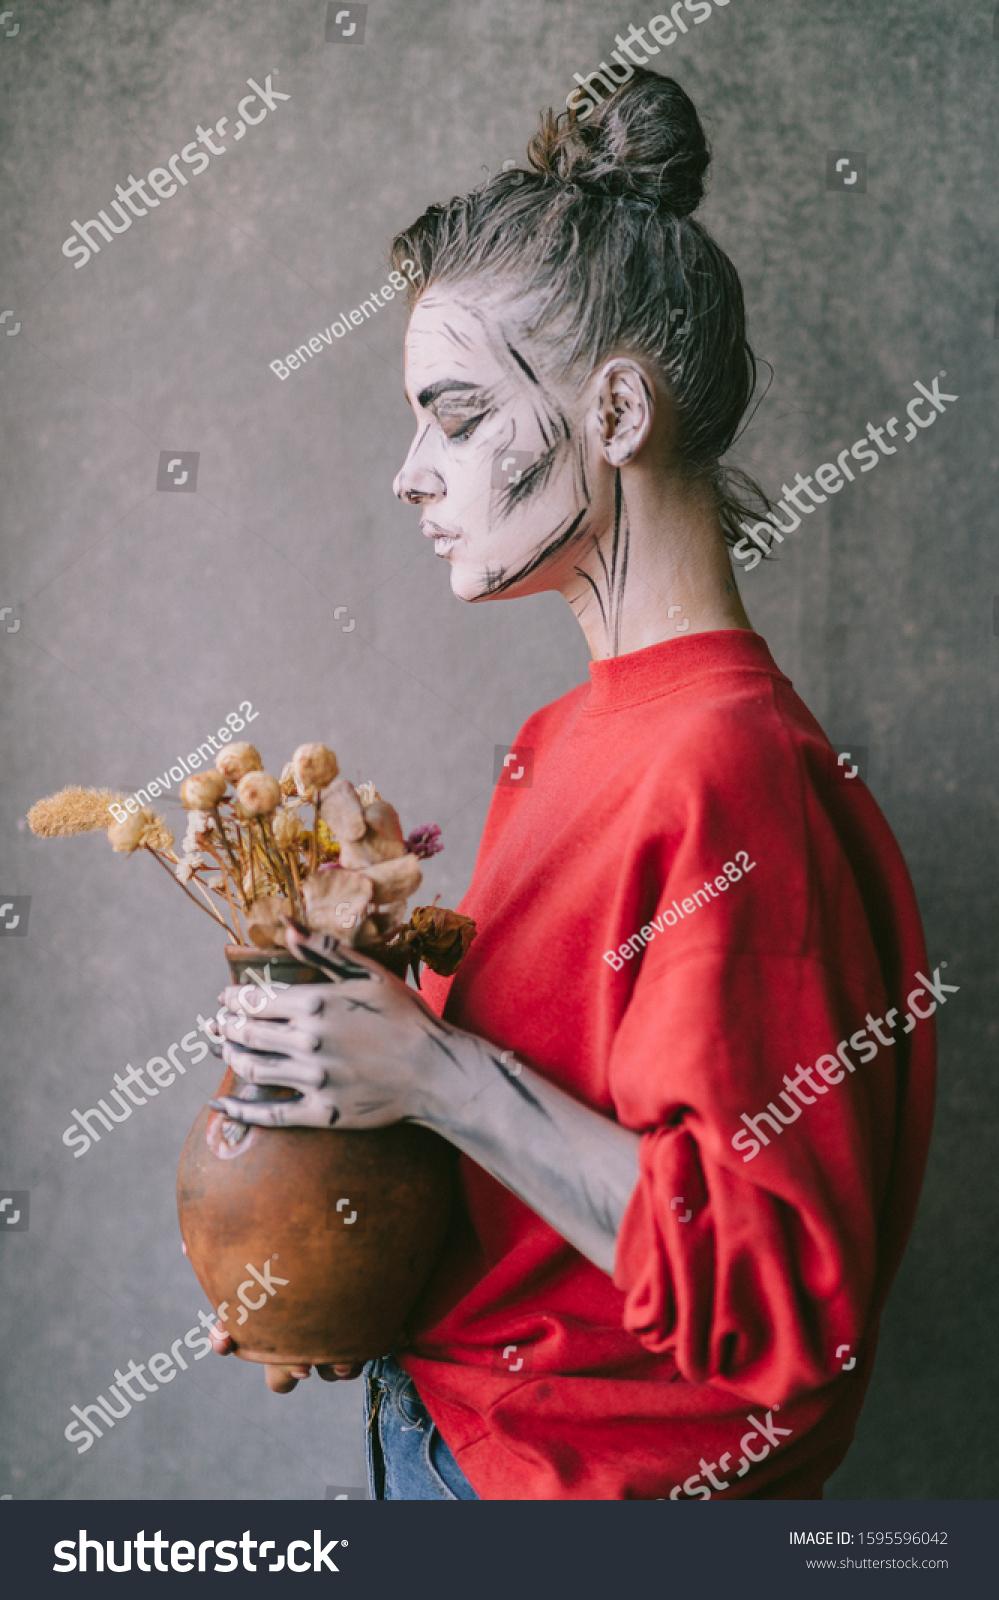 Lovely Young Girl Skeleton Body Art Stock Photo Edit Now 1595596042